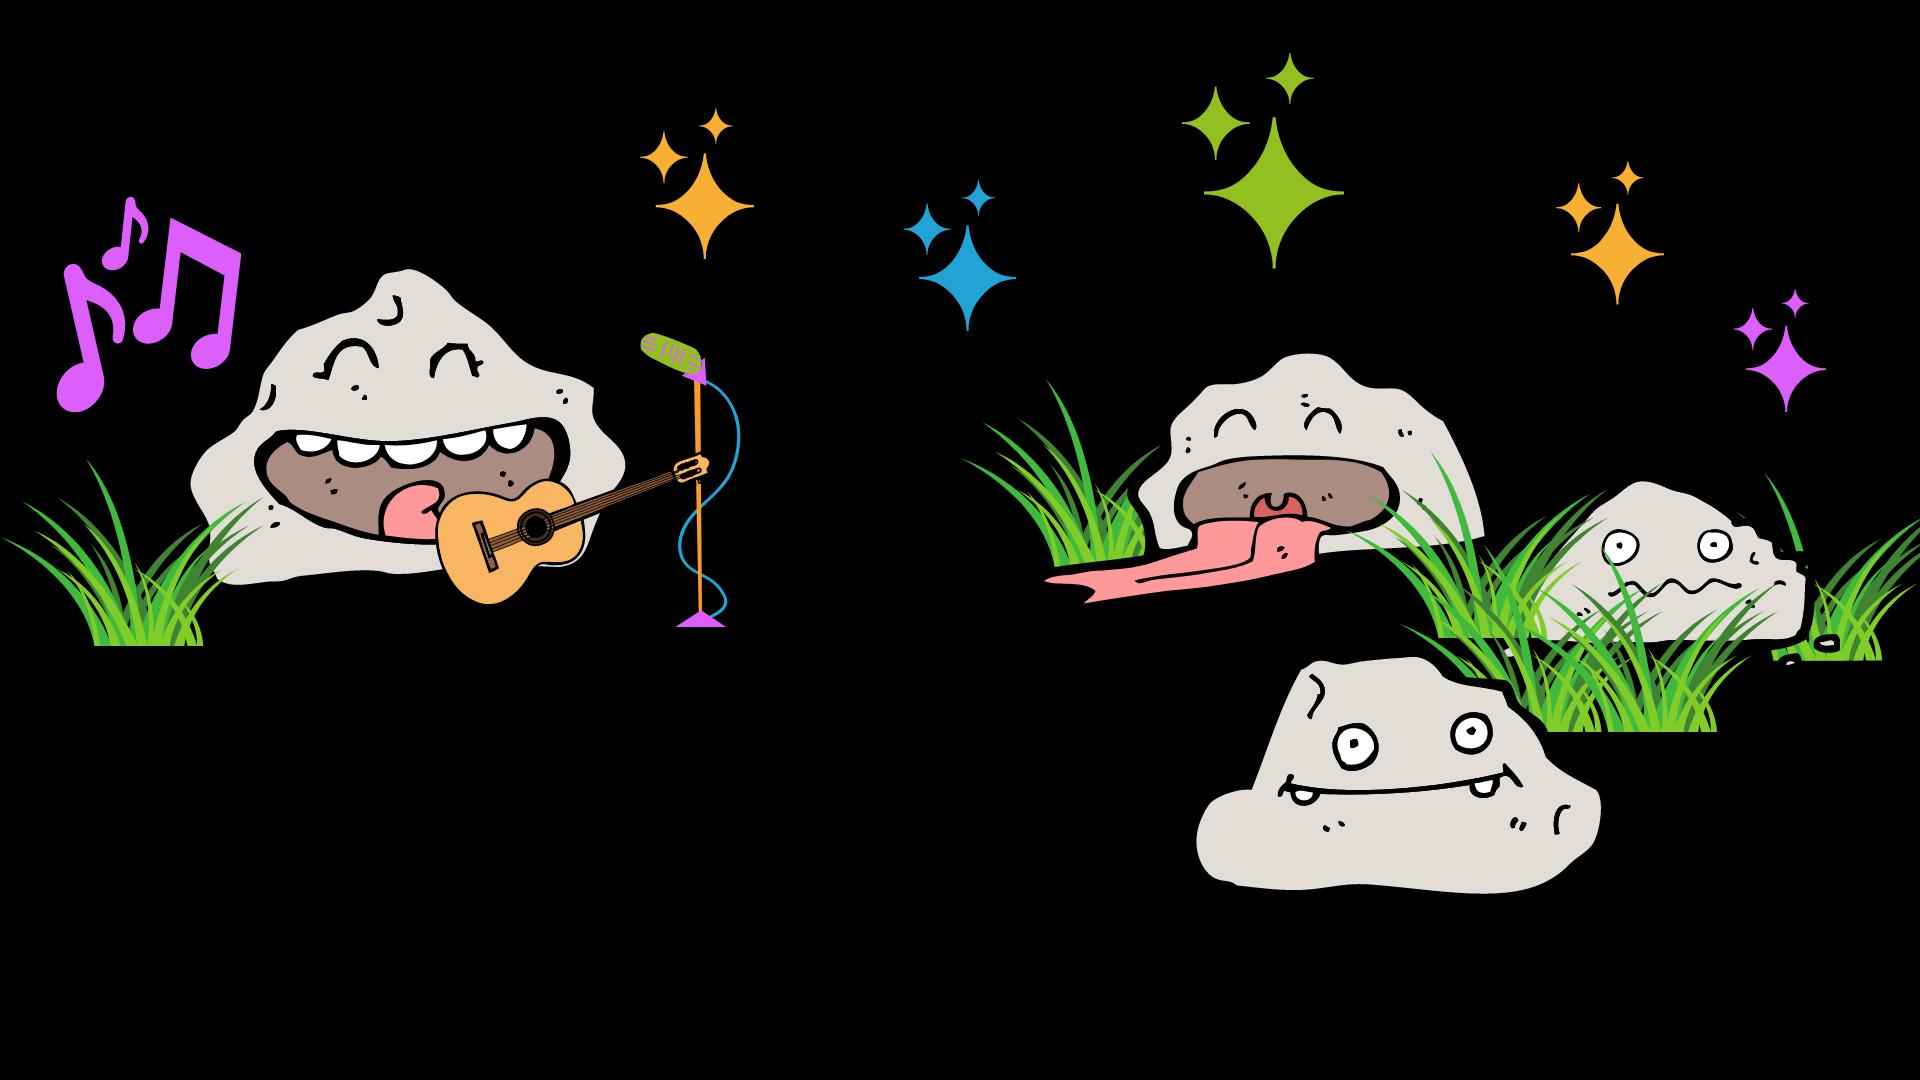 Rock Star Image